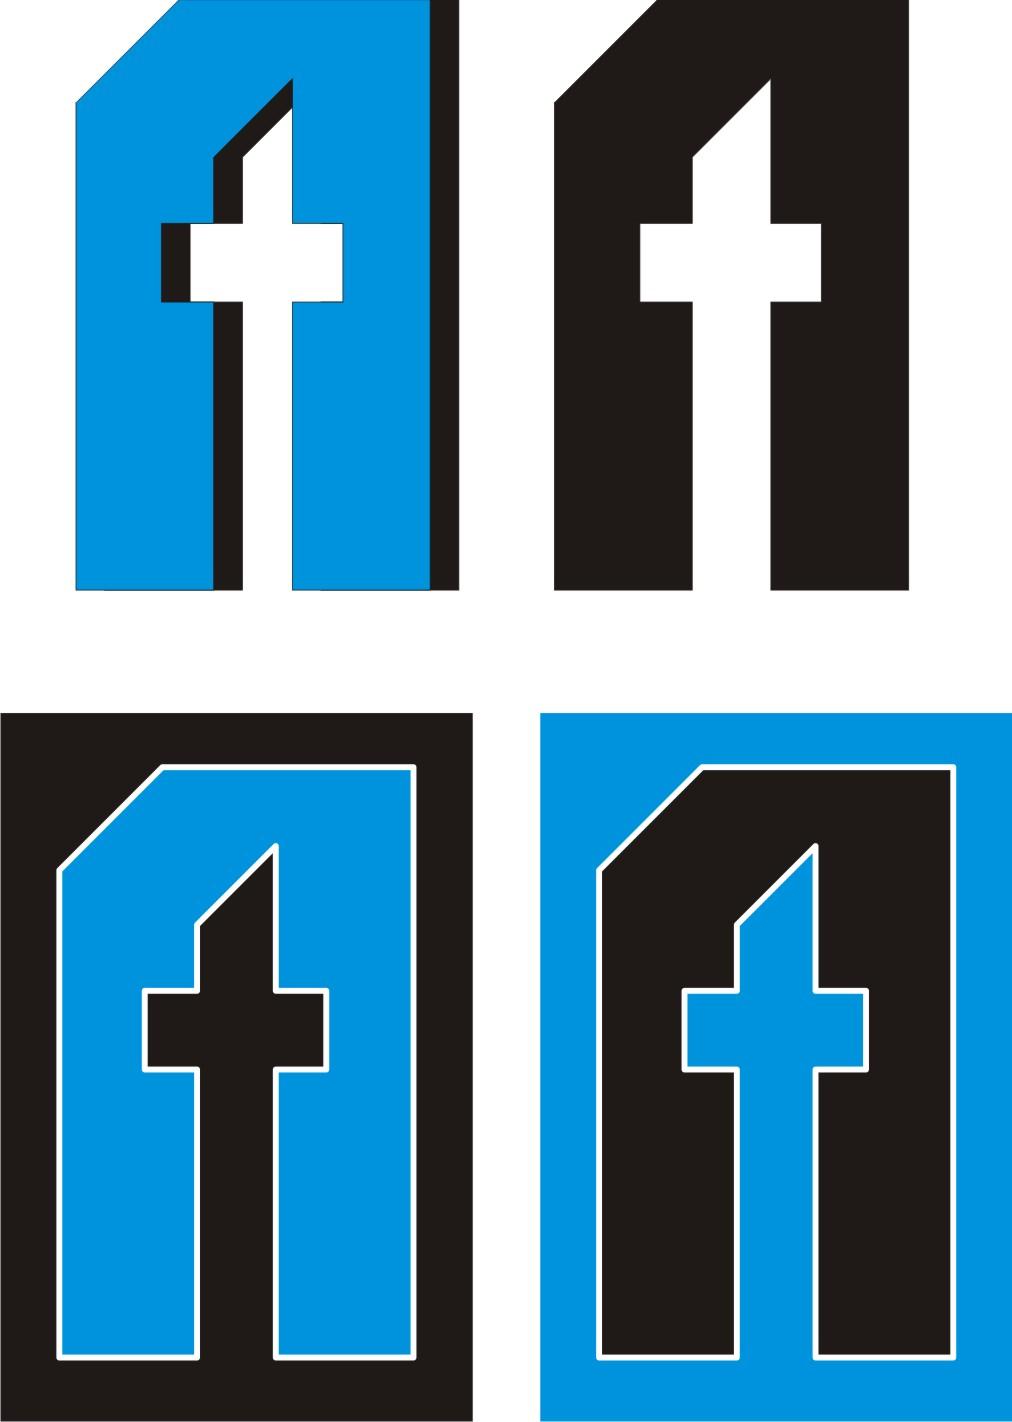 Logo Design by Korsunov Oleg - Entry No. 45 in the Logo Design Contest Imaginative Logo Design for TAYA.